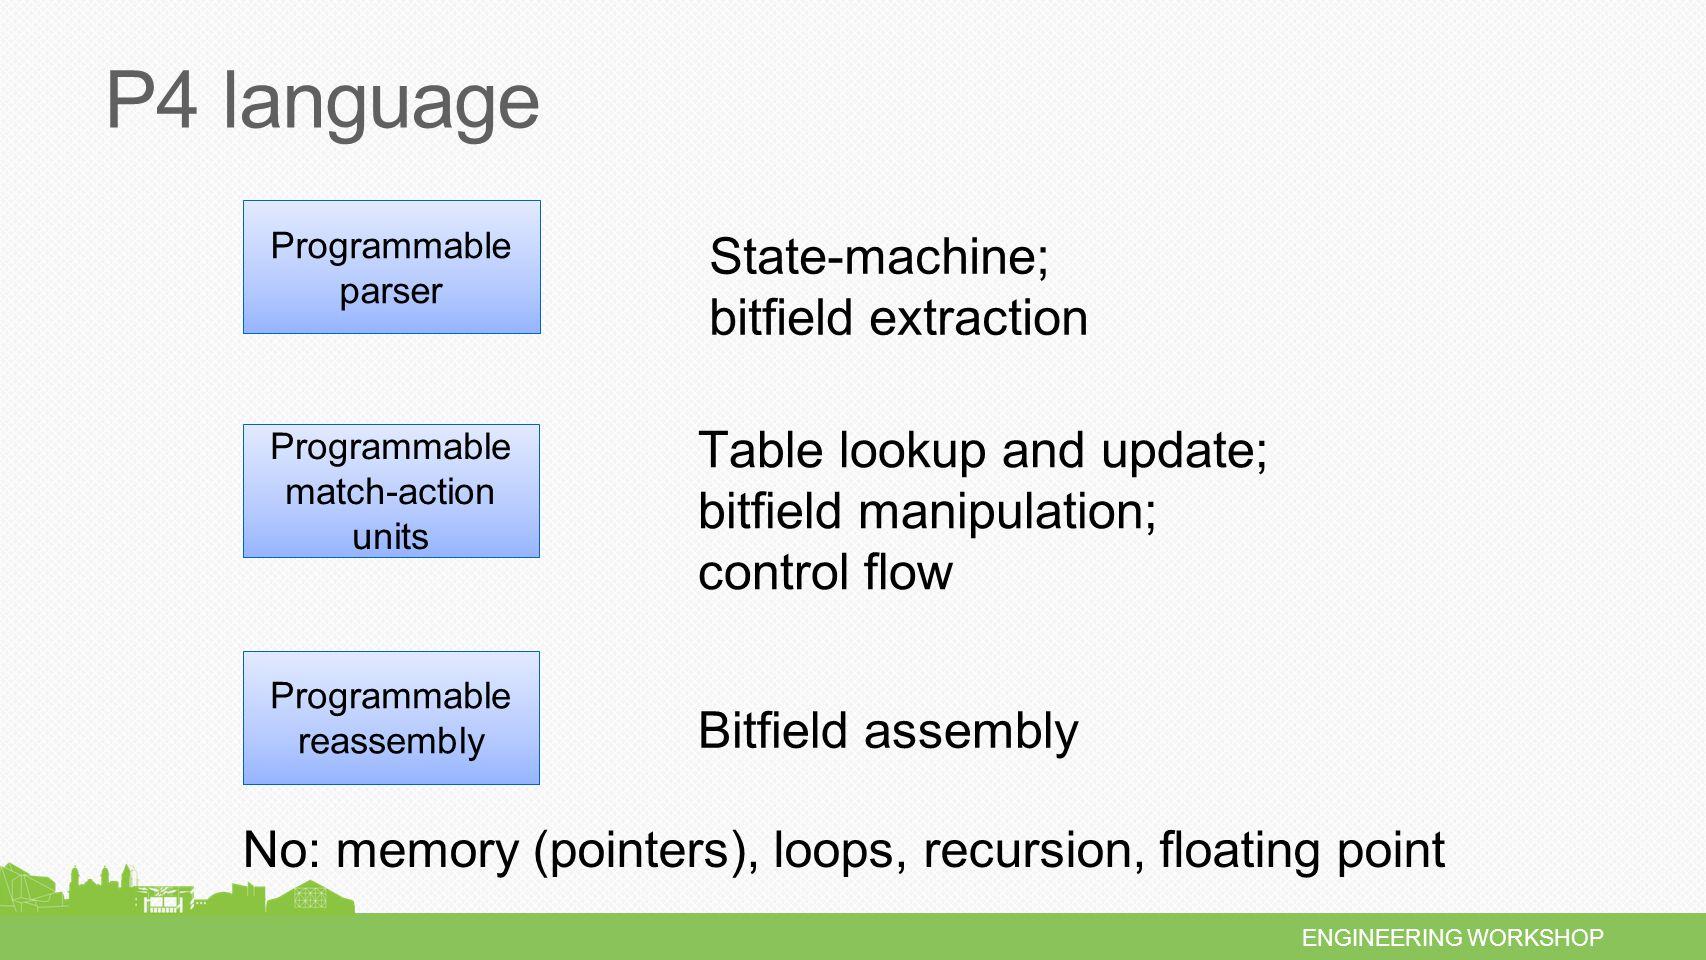 ENGINEERING WORKSHOP Parsing = State machines header_type ethernet_t { fields { dstAddr : 48; srcAddr : 48; etherType : 16; } parser parse_ethernet { extract(ethernet); return select(latest.etherType) { 0x8100 : parse_vlan; 0x800 : parse_ipv4; 0x86DD : parse_ipv6; } TCP New IPv4 IPv6 VLAN Eth